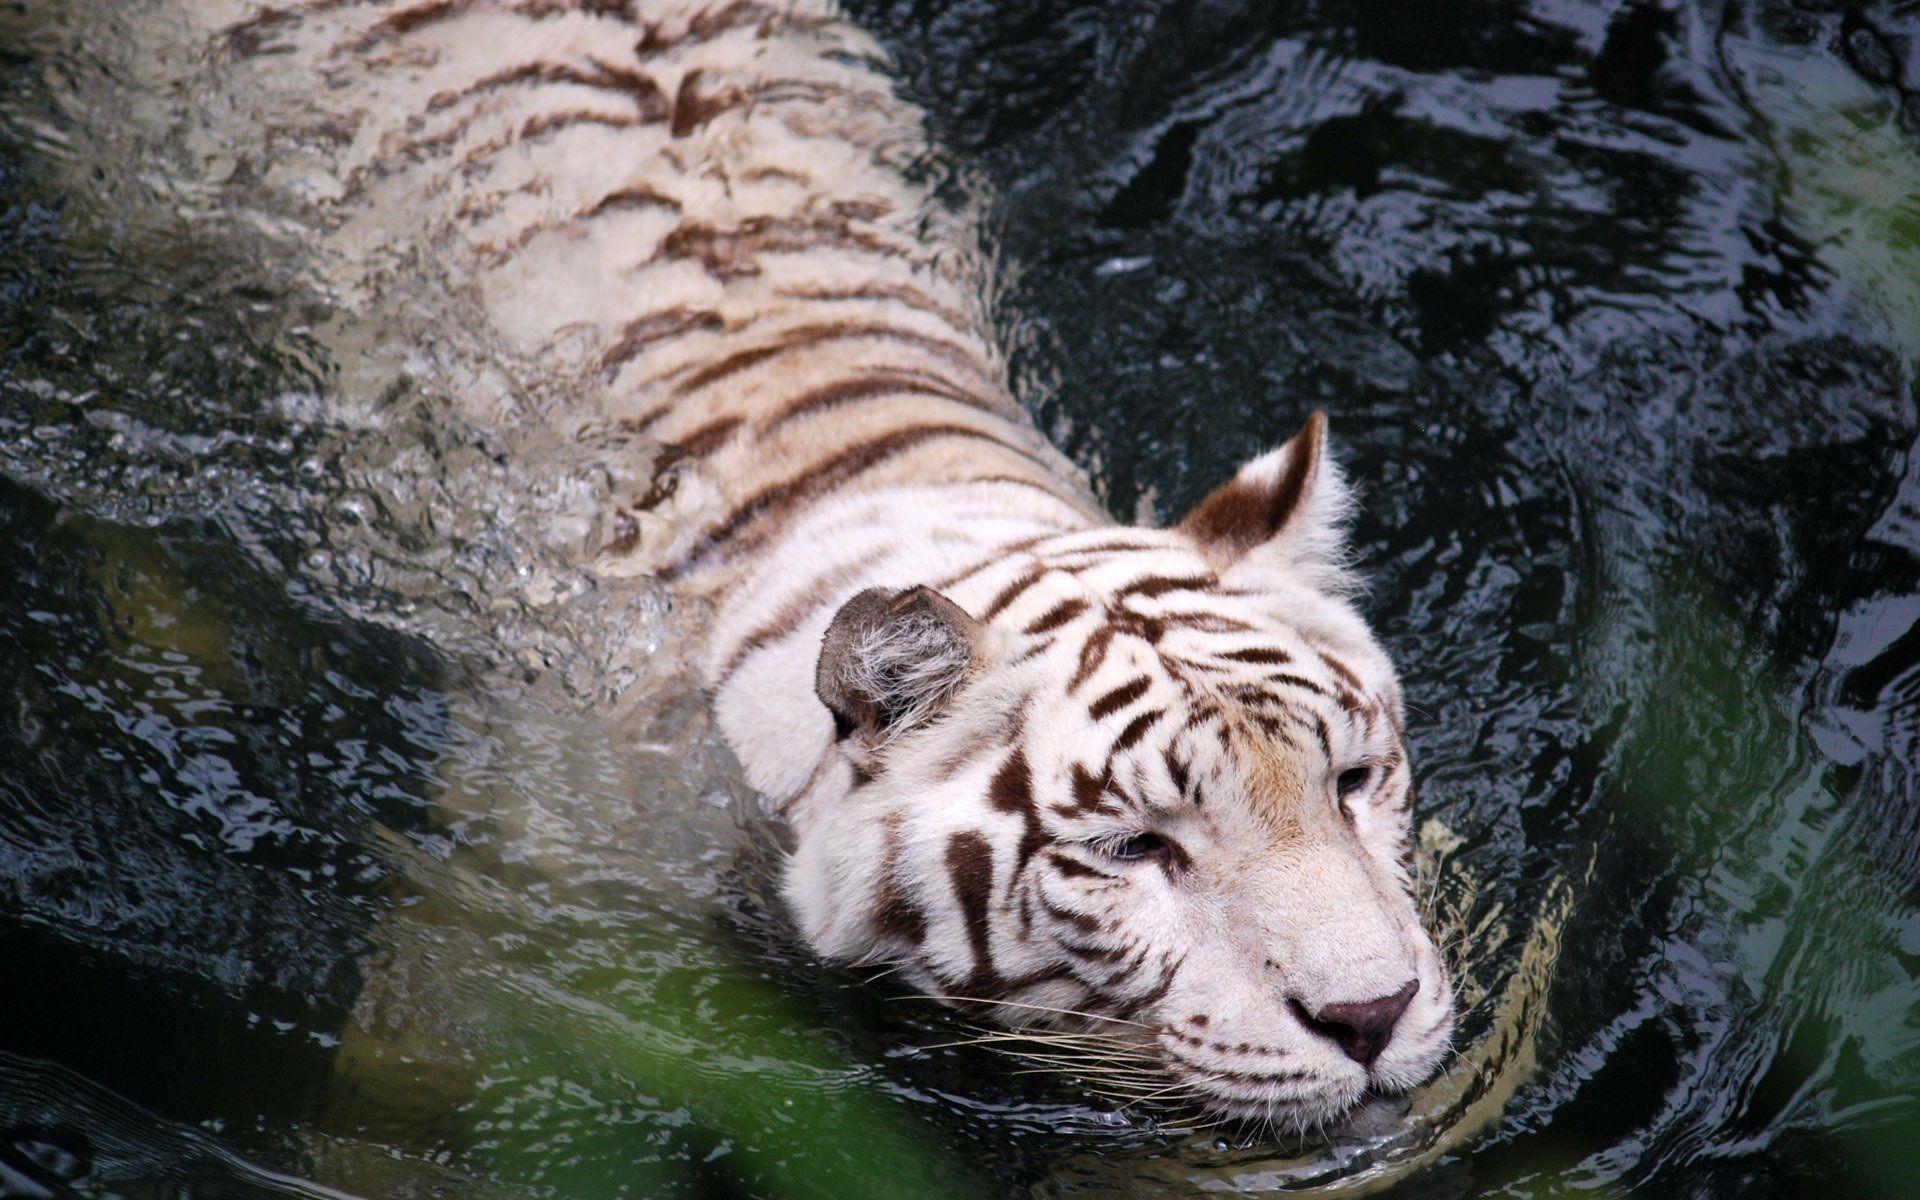 White Tiger swimming, Good Wallpaper